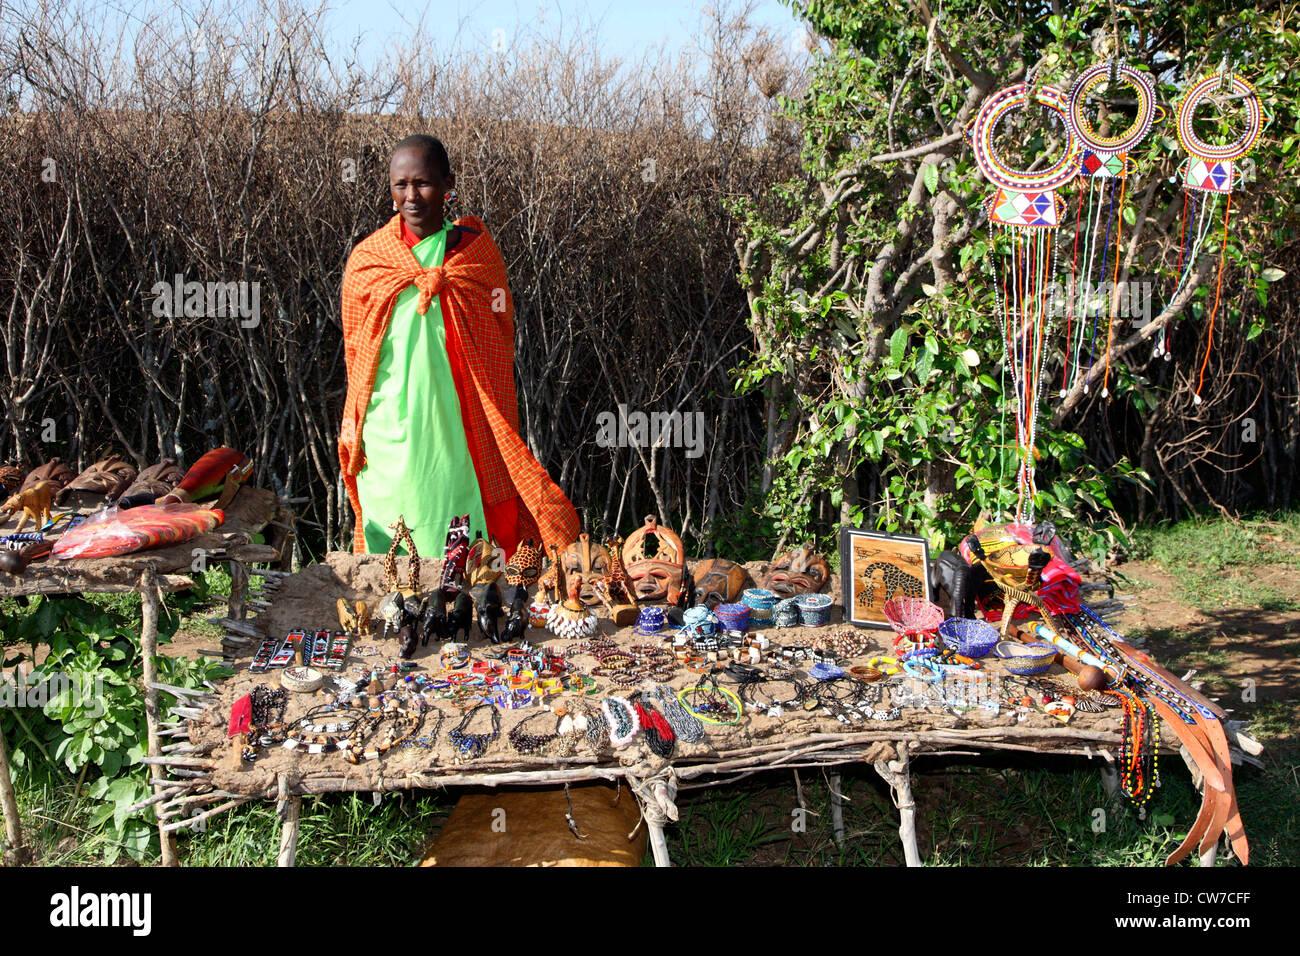 Women and Masai jewelry, Kenya, Masai Mara National Park - Stock Image